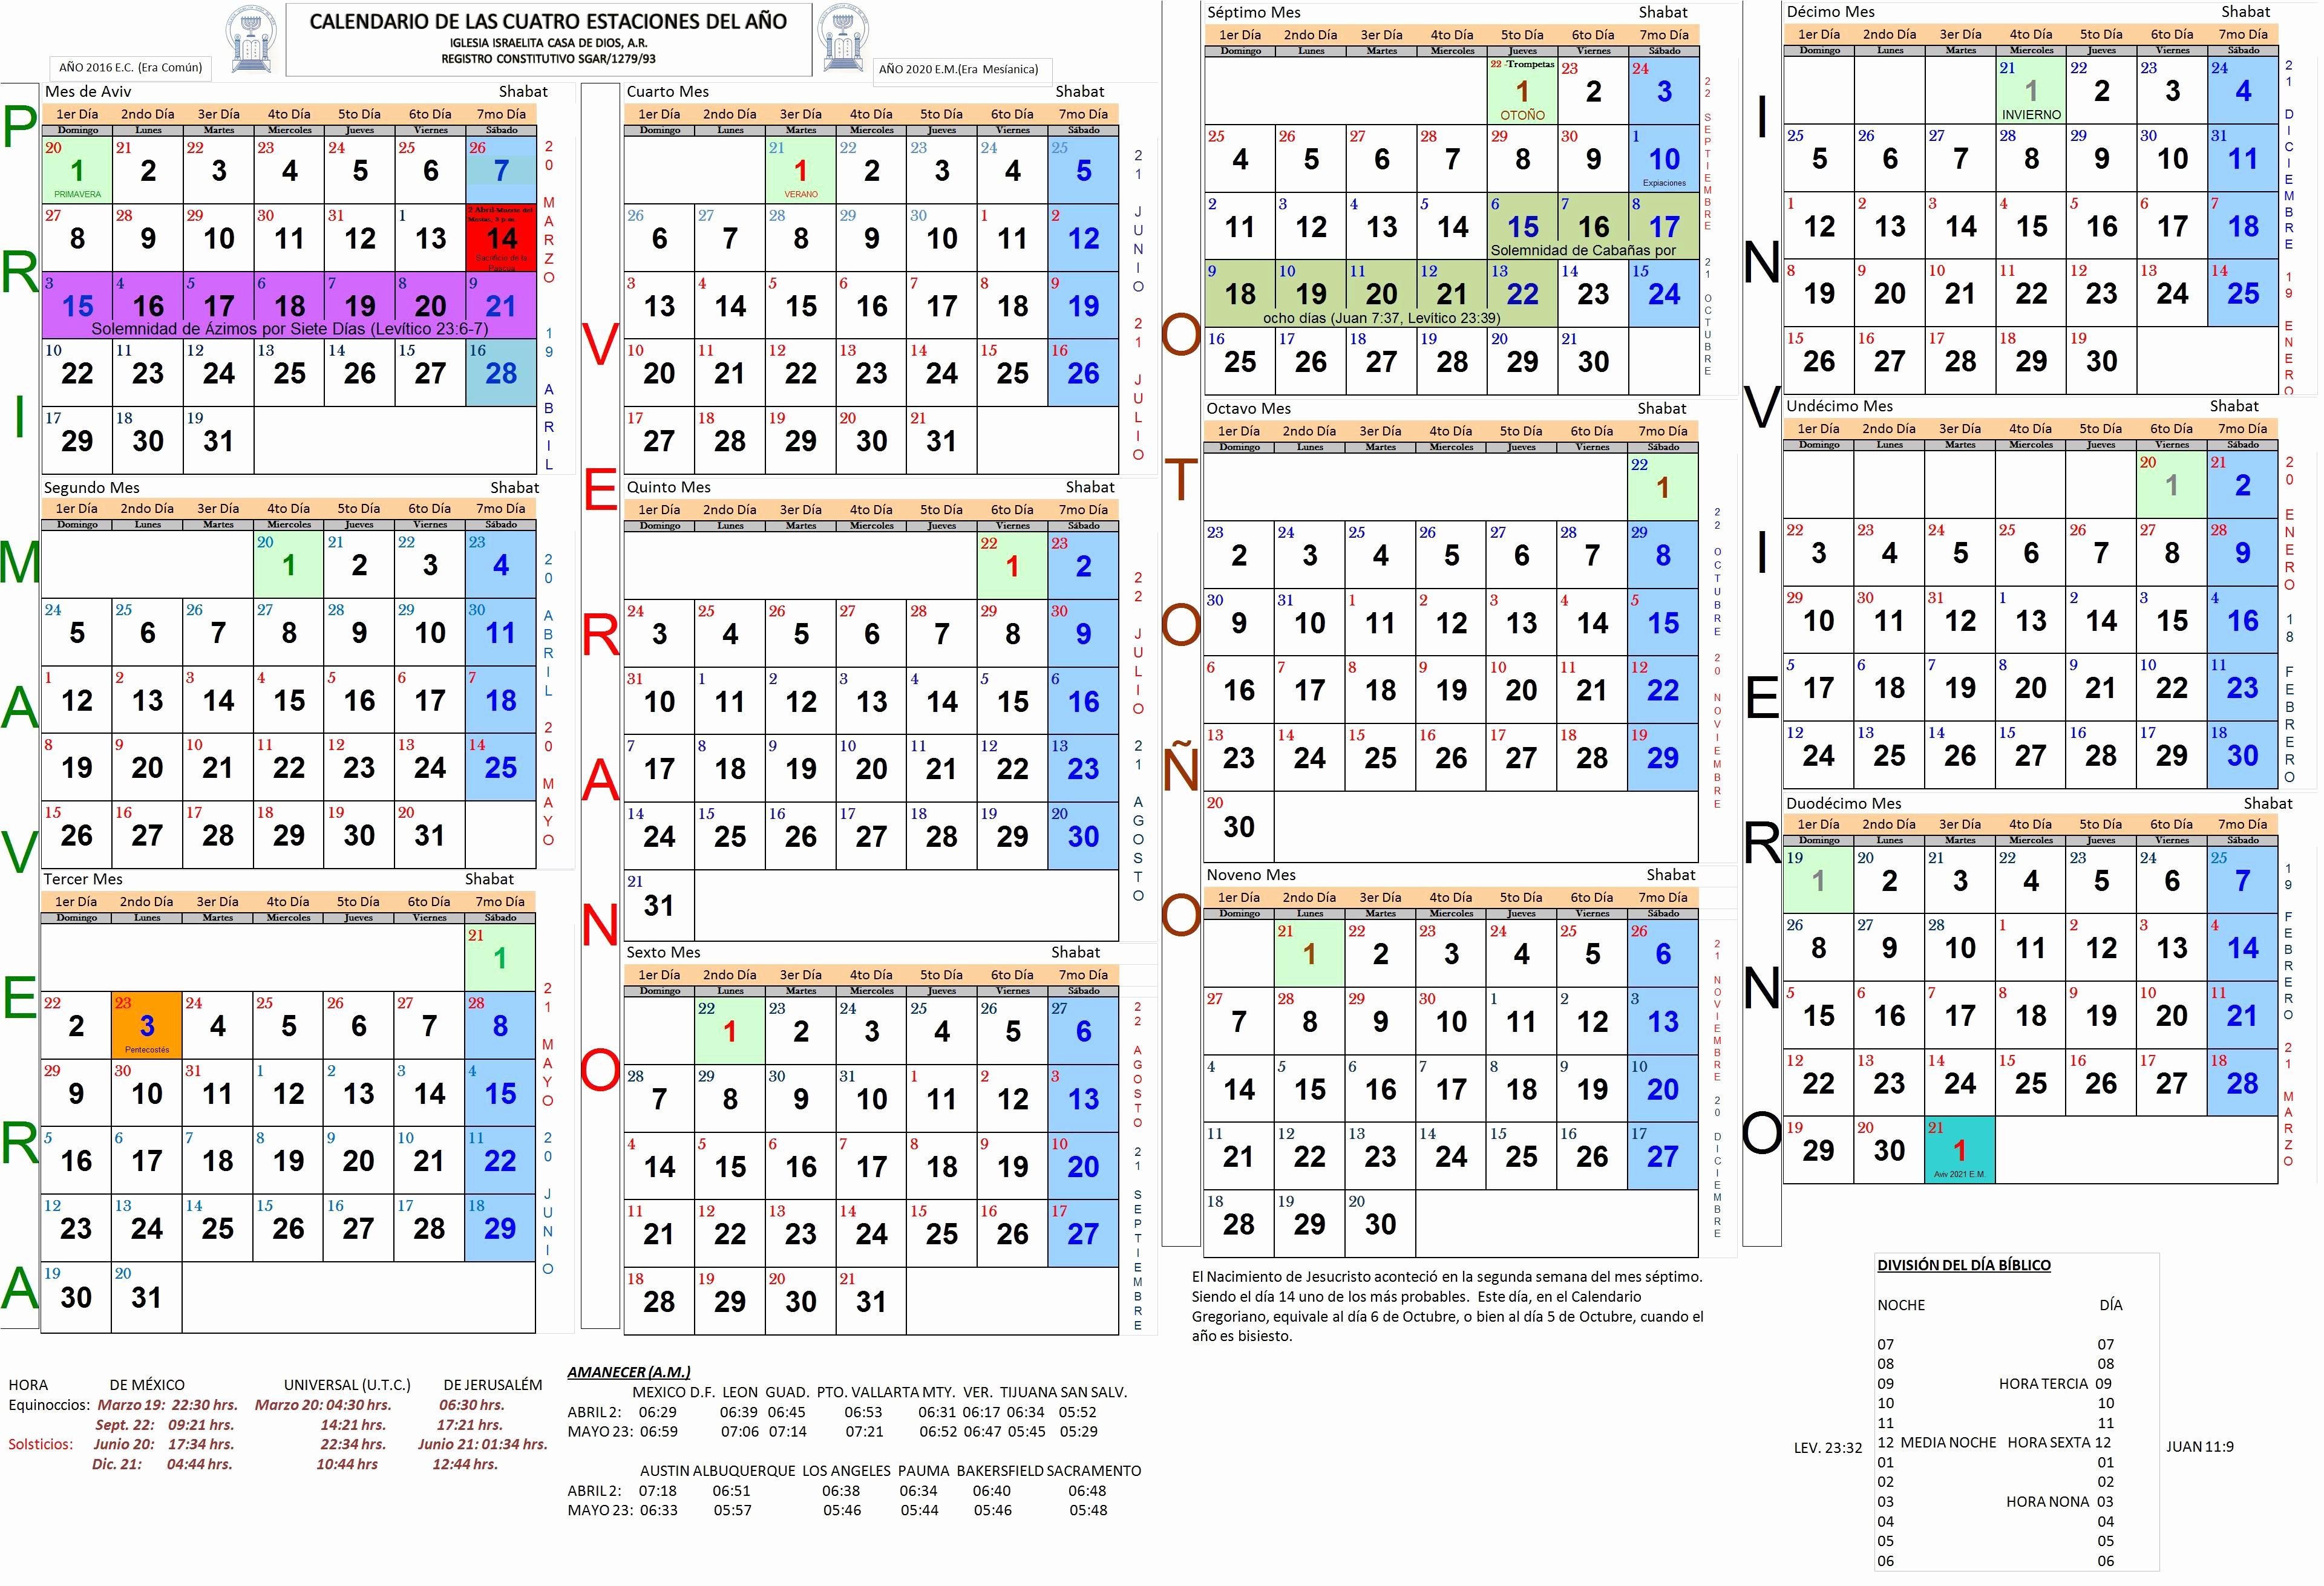 Calendario Abril 2019 Con Festivos Más Arriba-a-fecha Calendario 2019 Pascua Calendario Laboral 2019 Festivos Y Puentes En Of Calendario Abril 2019 Con Festivos Más Recientemente Liberado Calendario 2018 Con Festivos — Fiesta De Lamusica Medellin